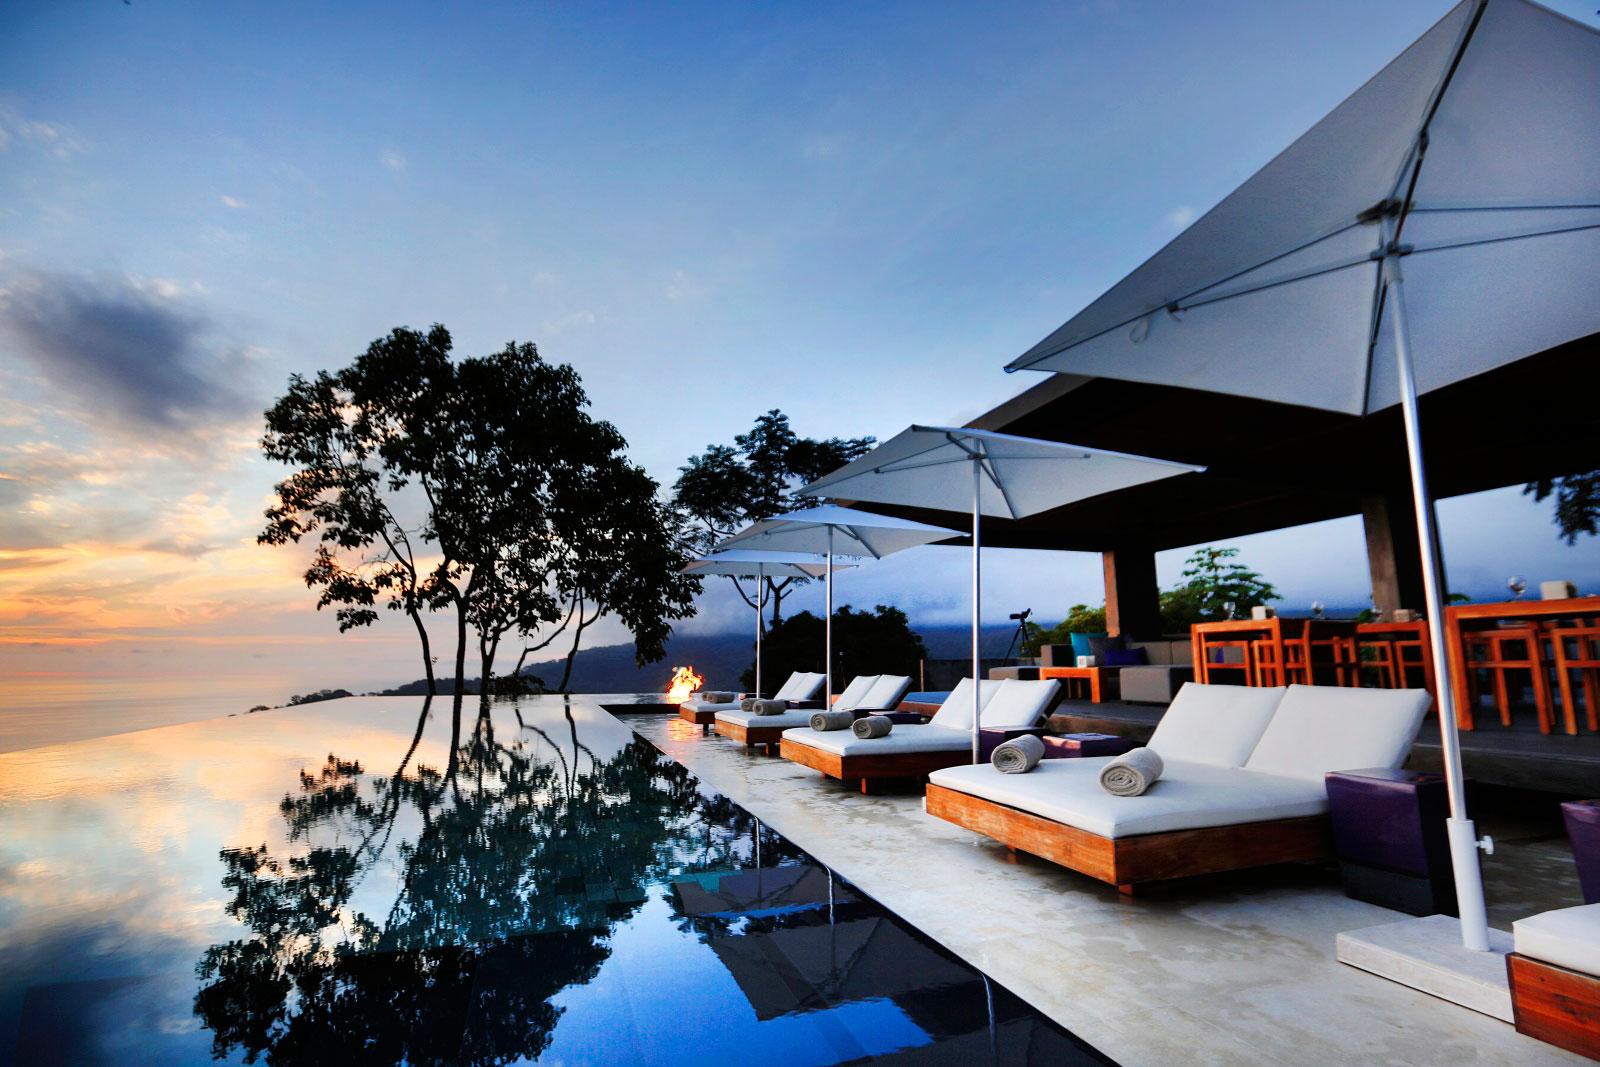 Evening, Terrace, Pool, Holiday Villas in Costa Rica